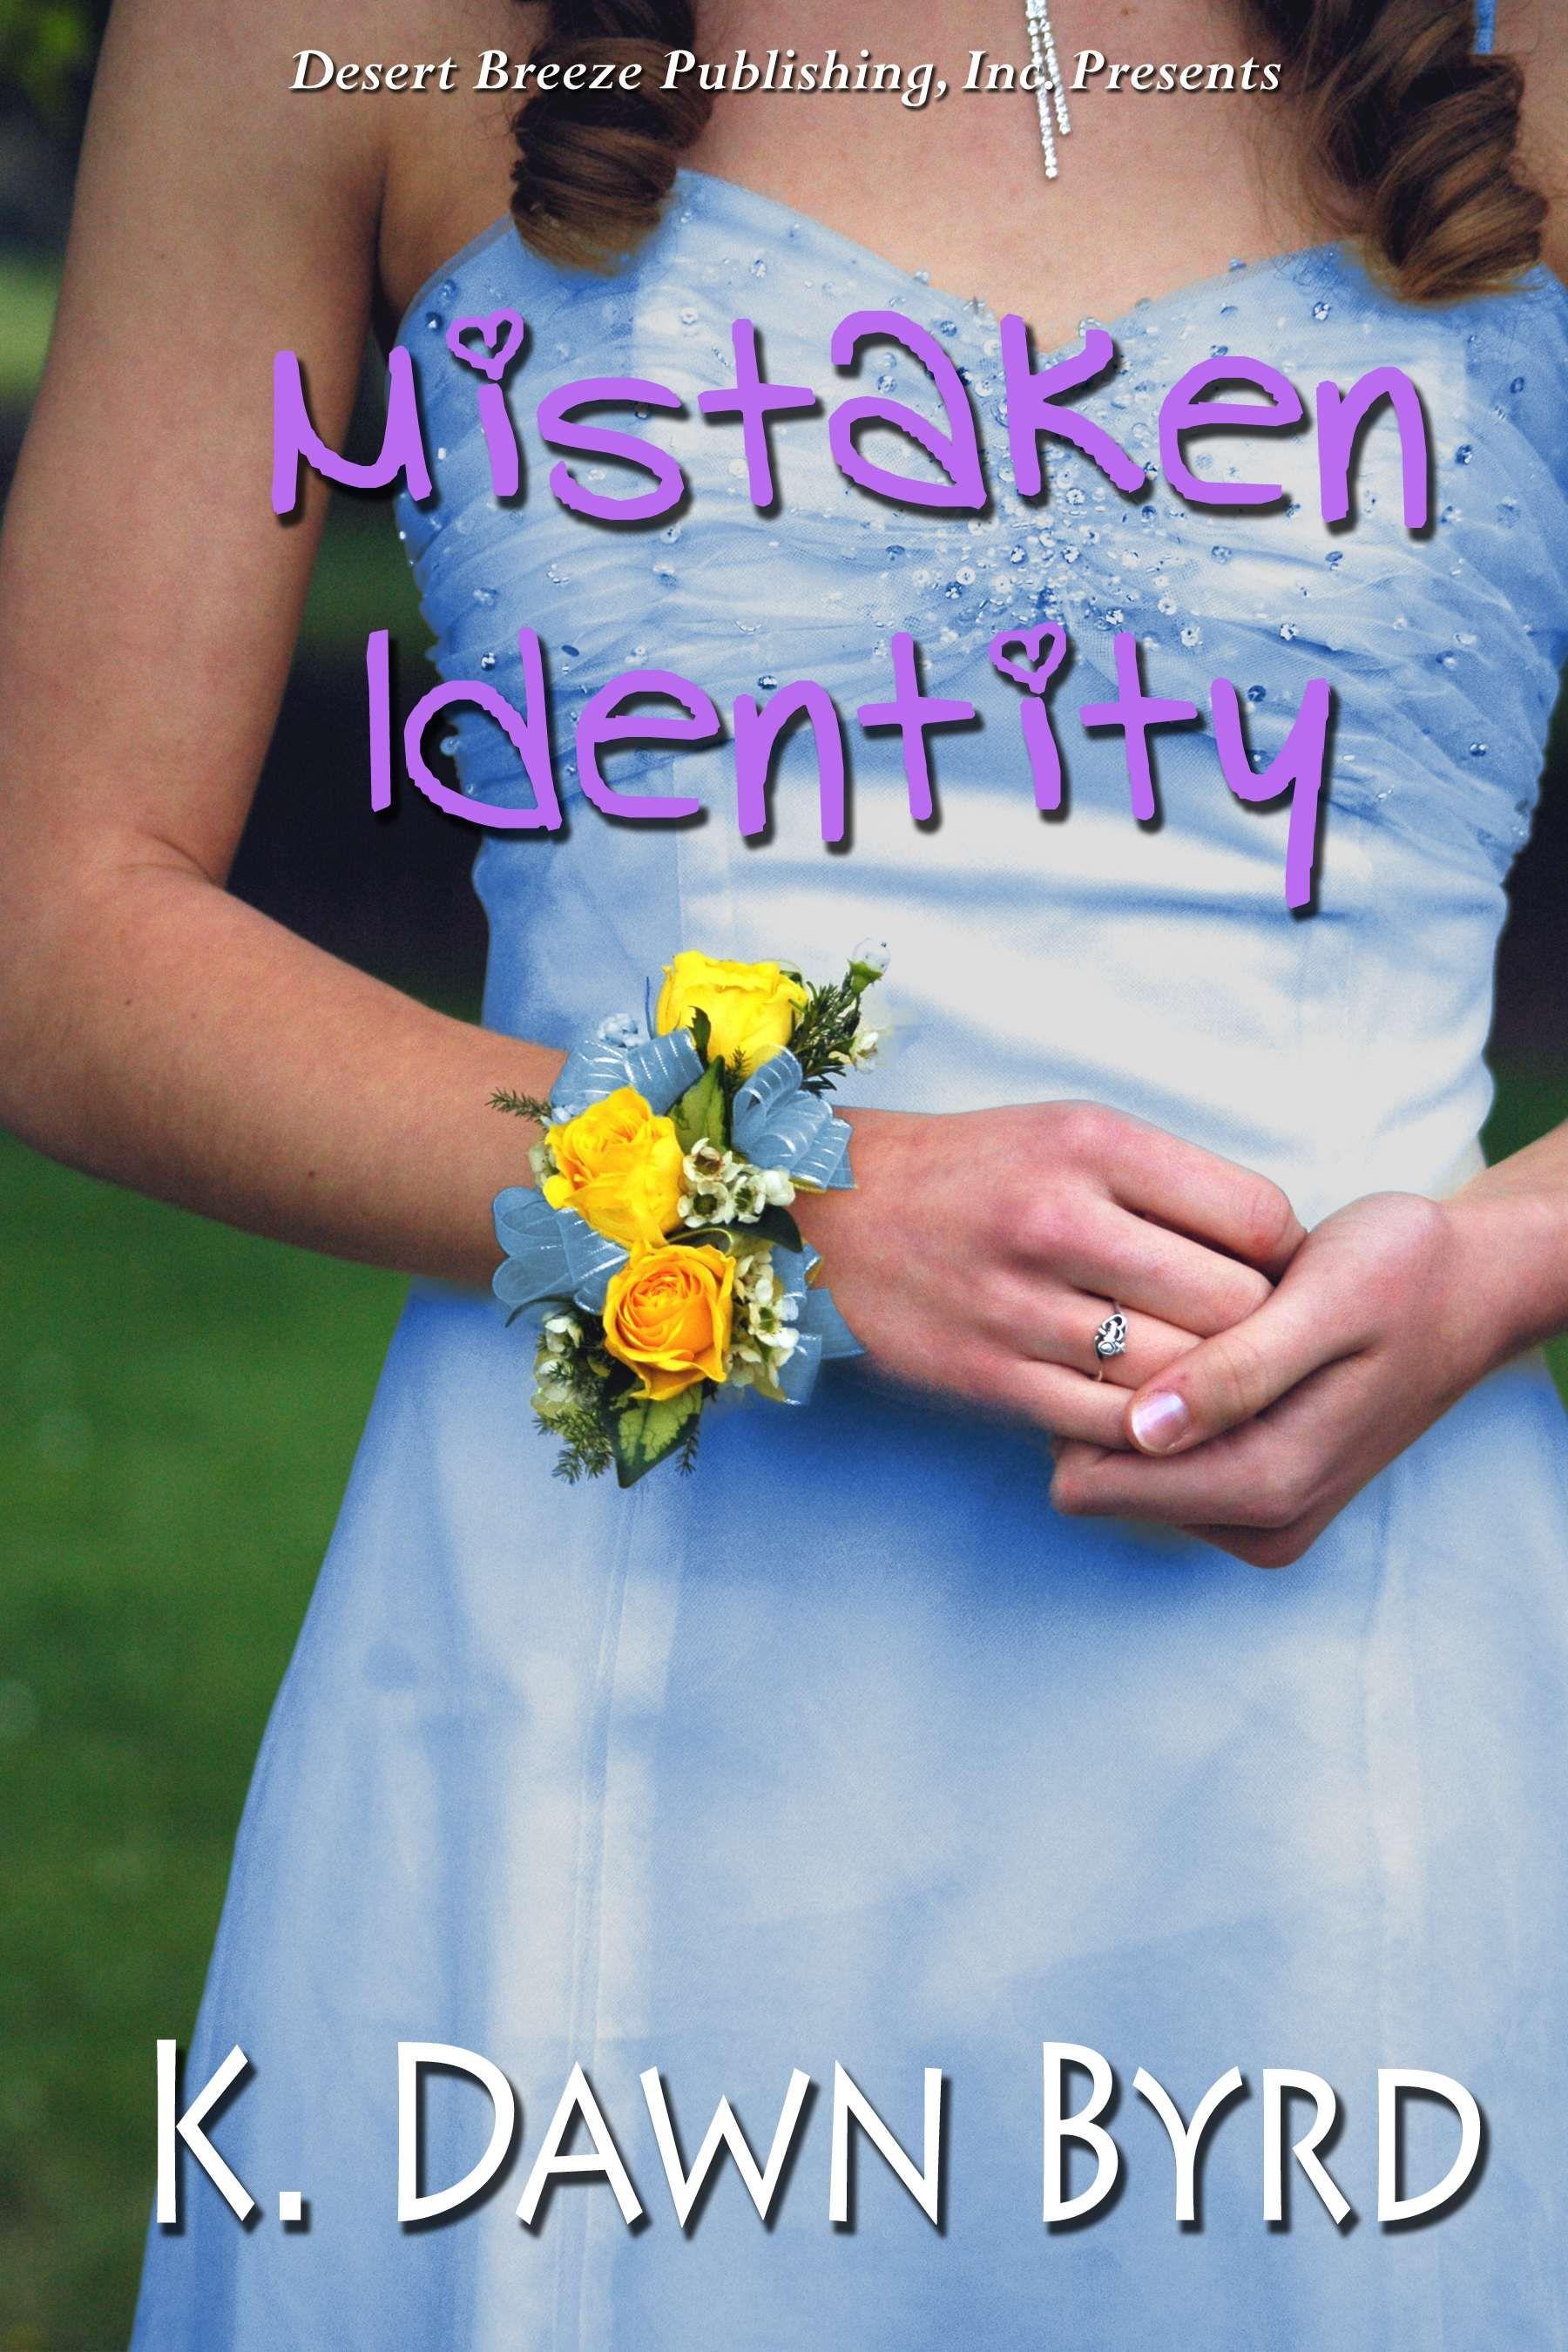 K. Dawn Byrd - Mistaken Identity